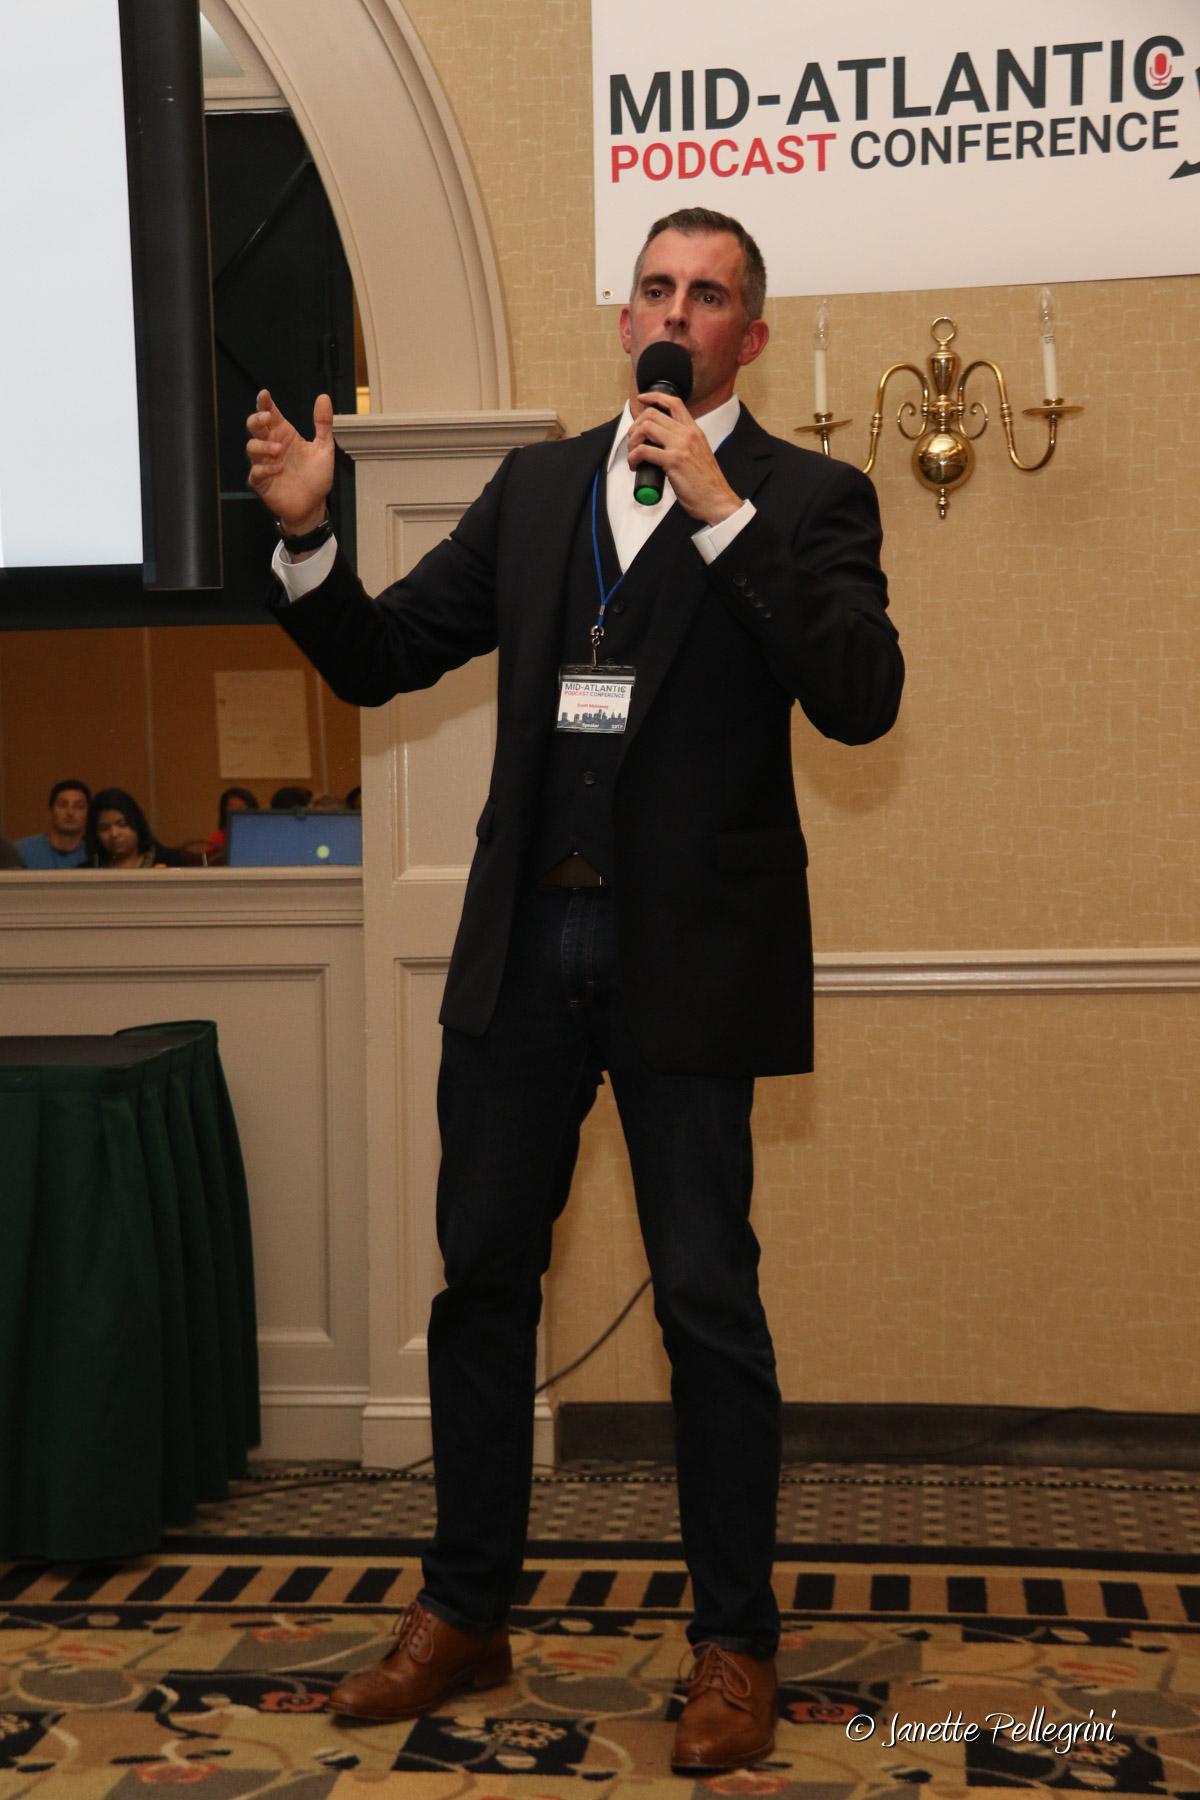 Public Speaker Scott Mulvaney of LIVETHEFUEL at MAPCON 2017